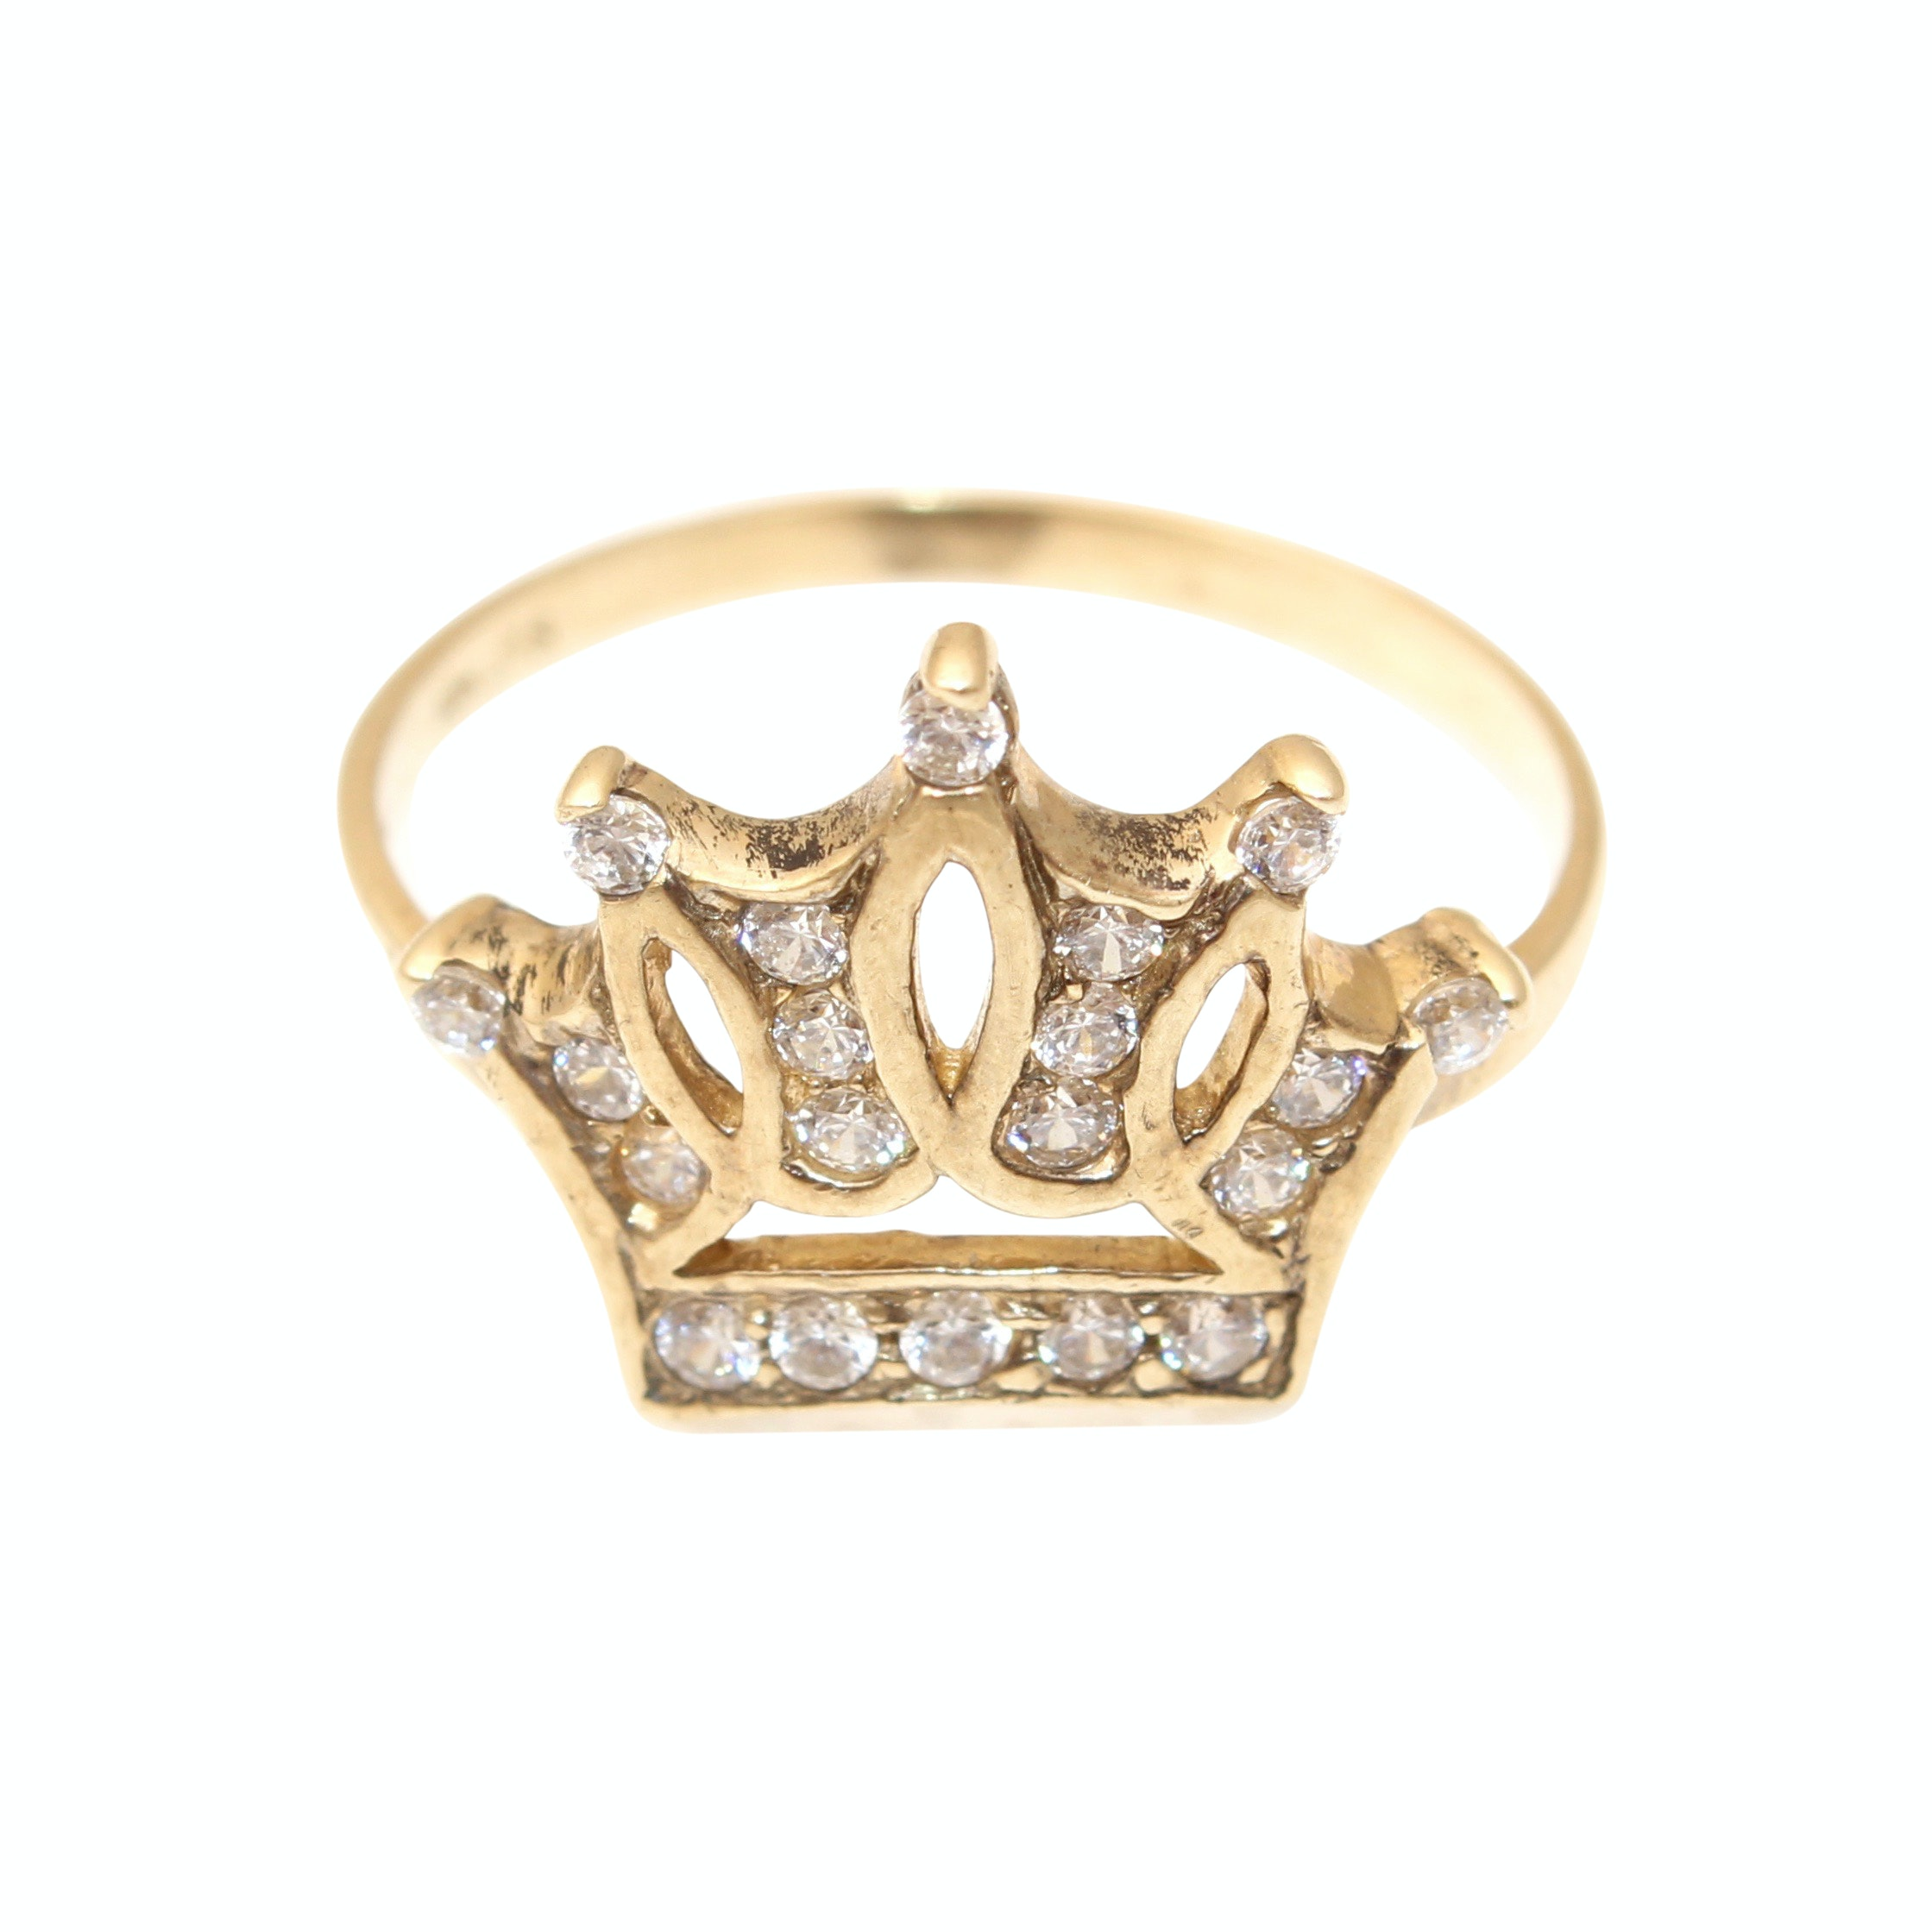 10K Yellow Gold Cubic Zirconia Crown Ring